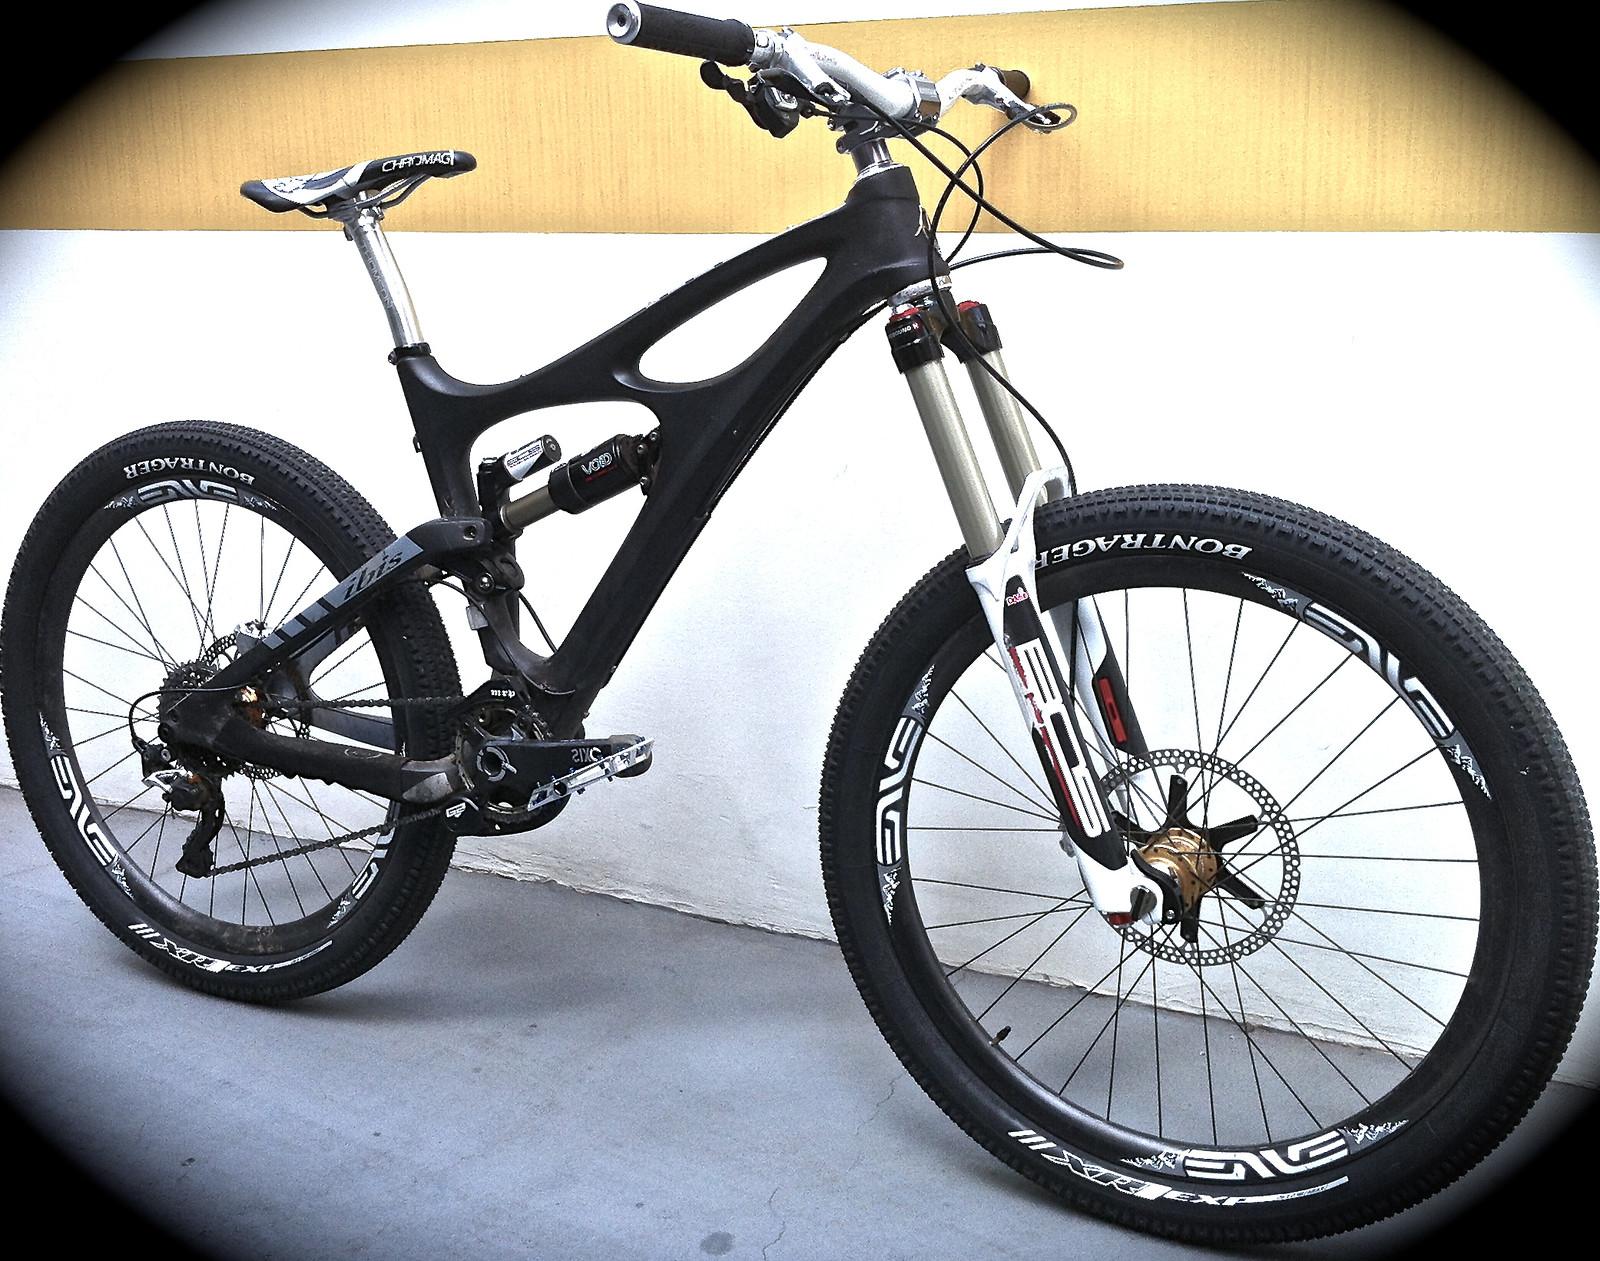 bos suspension mojo hd - luciano - Mountain Biking Pictures - Vital MTB